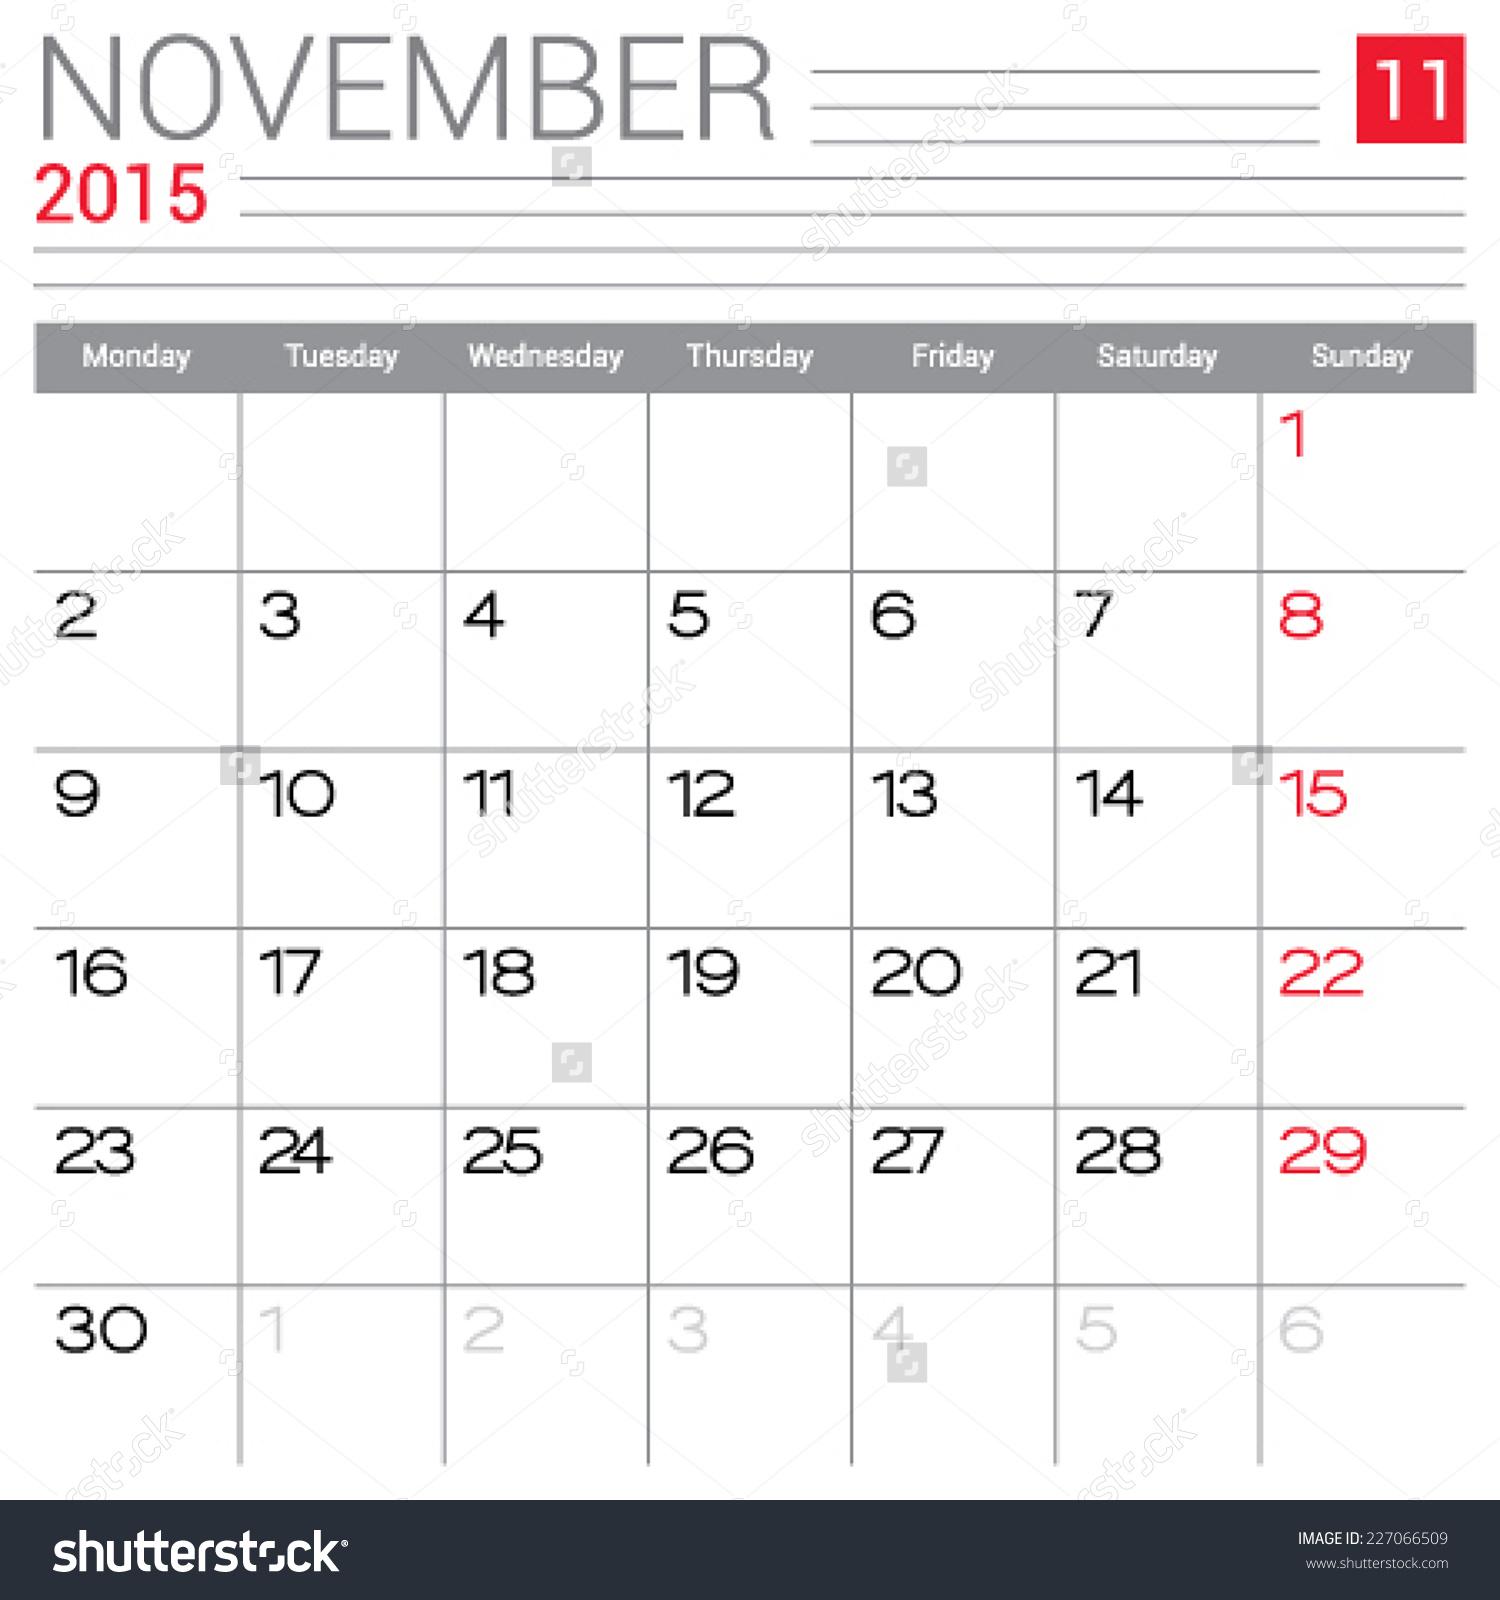 Simple Blank Calendar Template